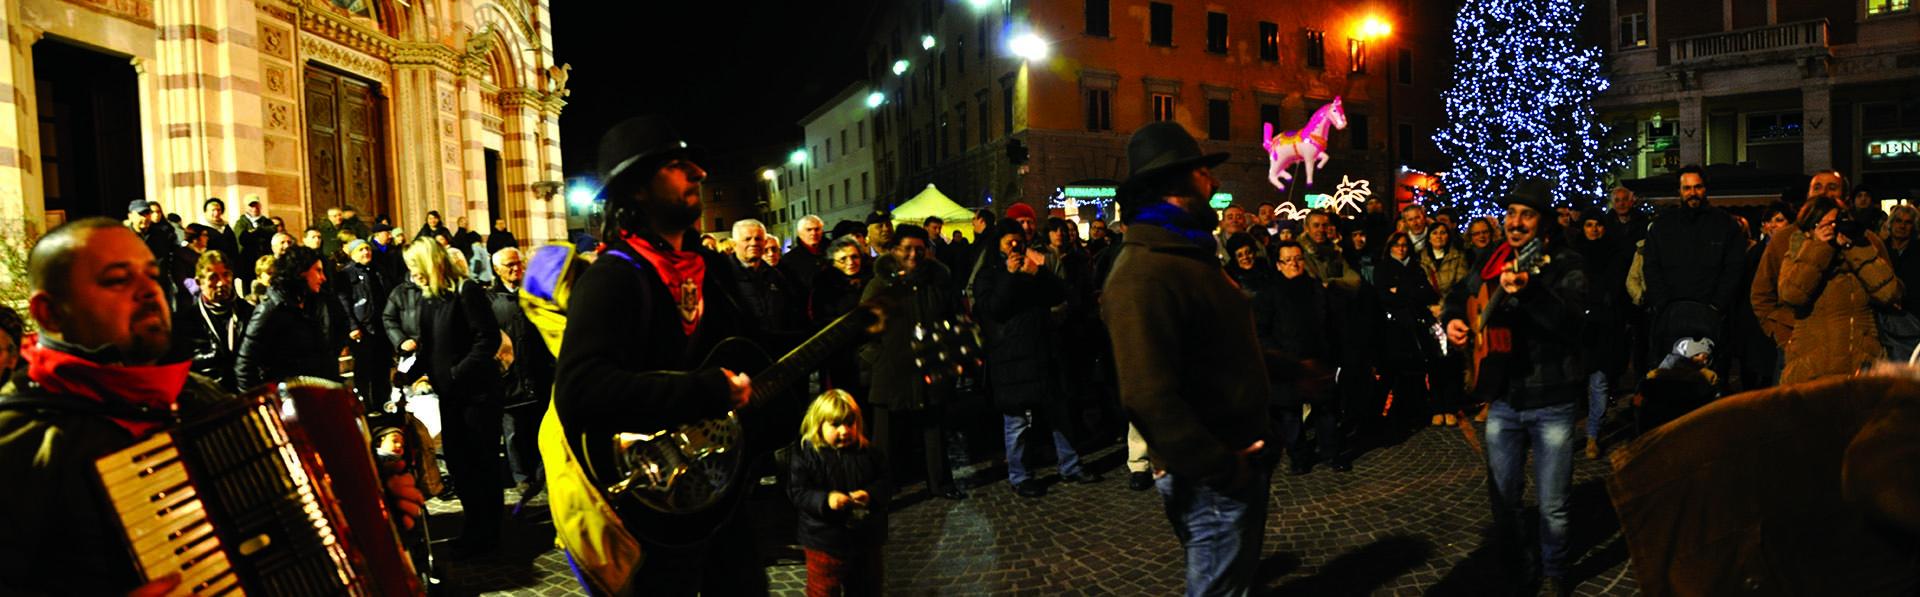 grosseto_befana_briganti_di_maremma_piazza duomo